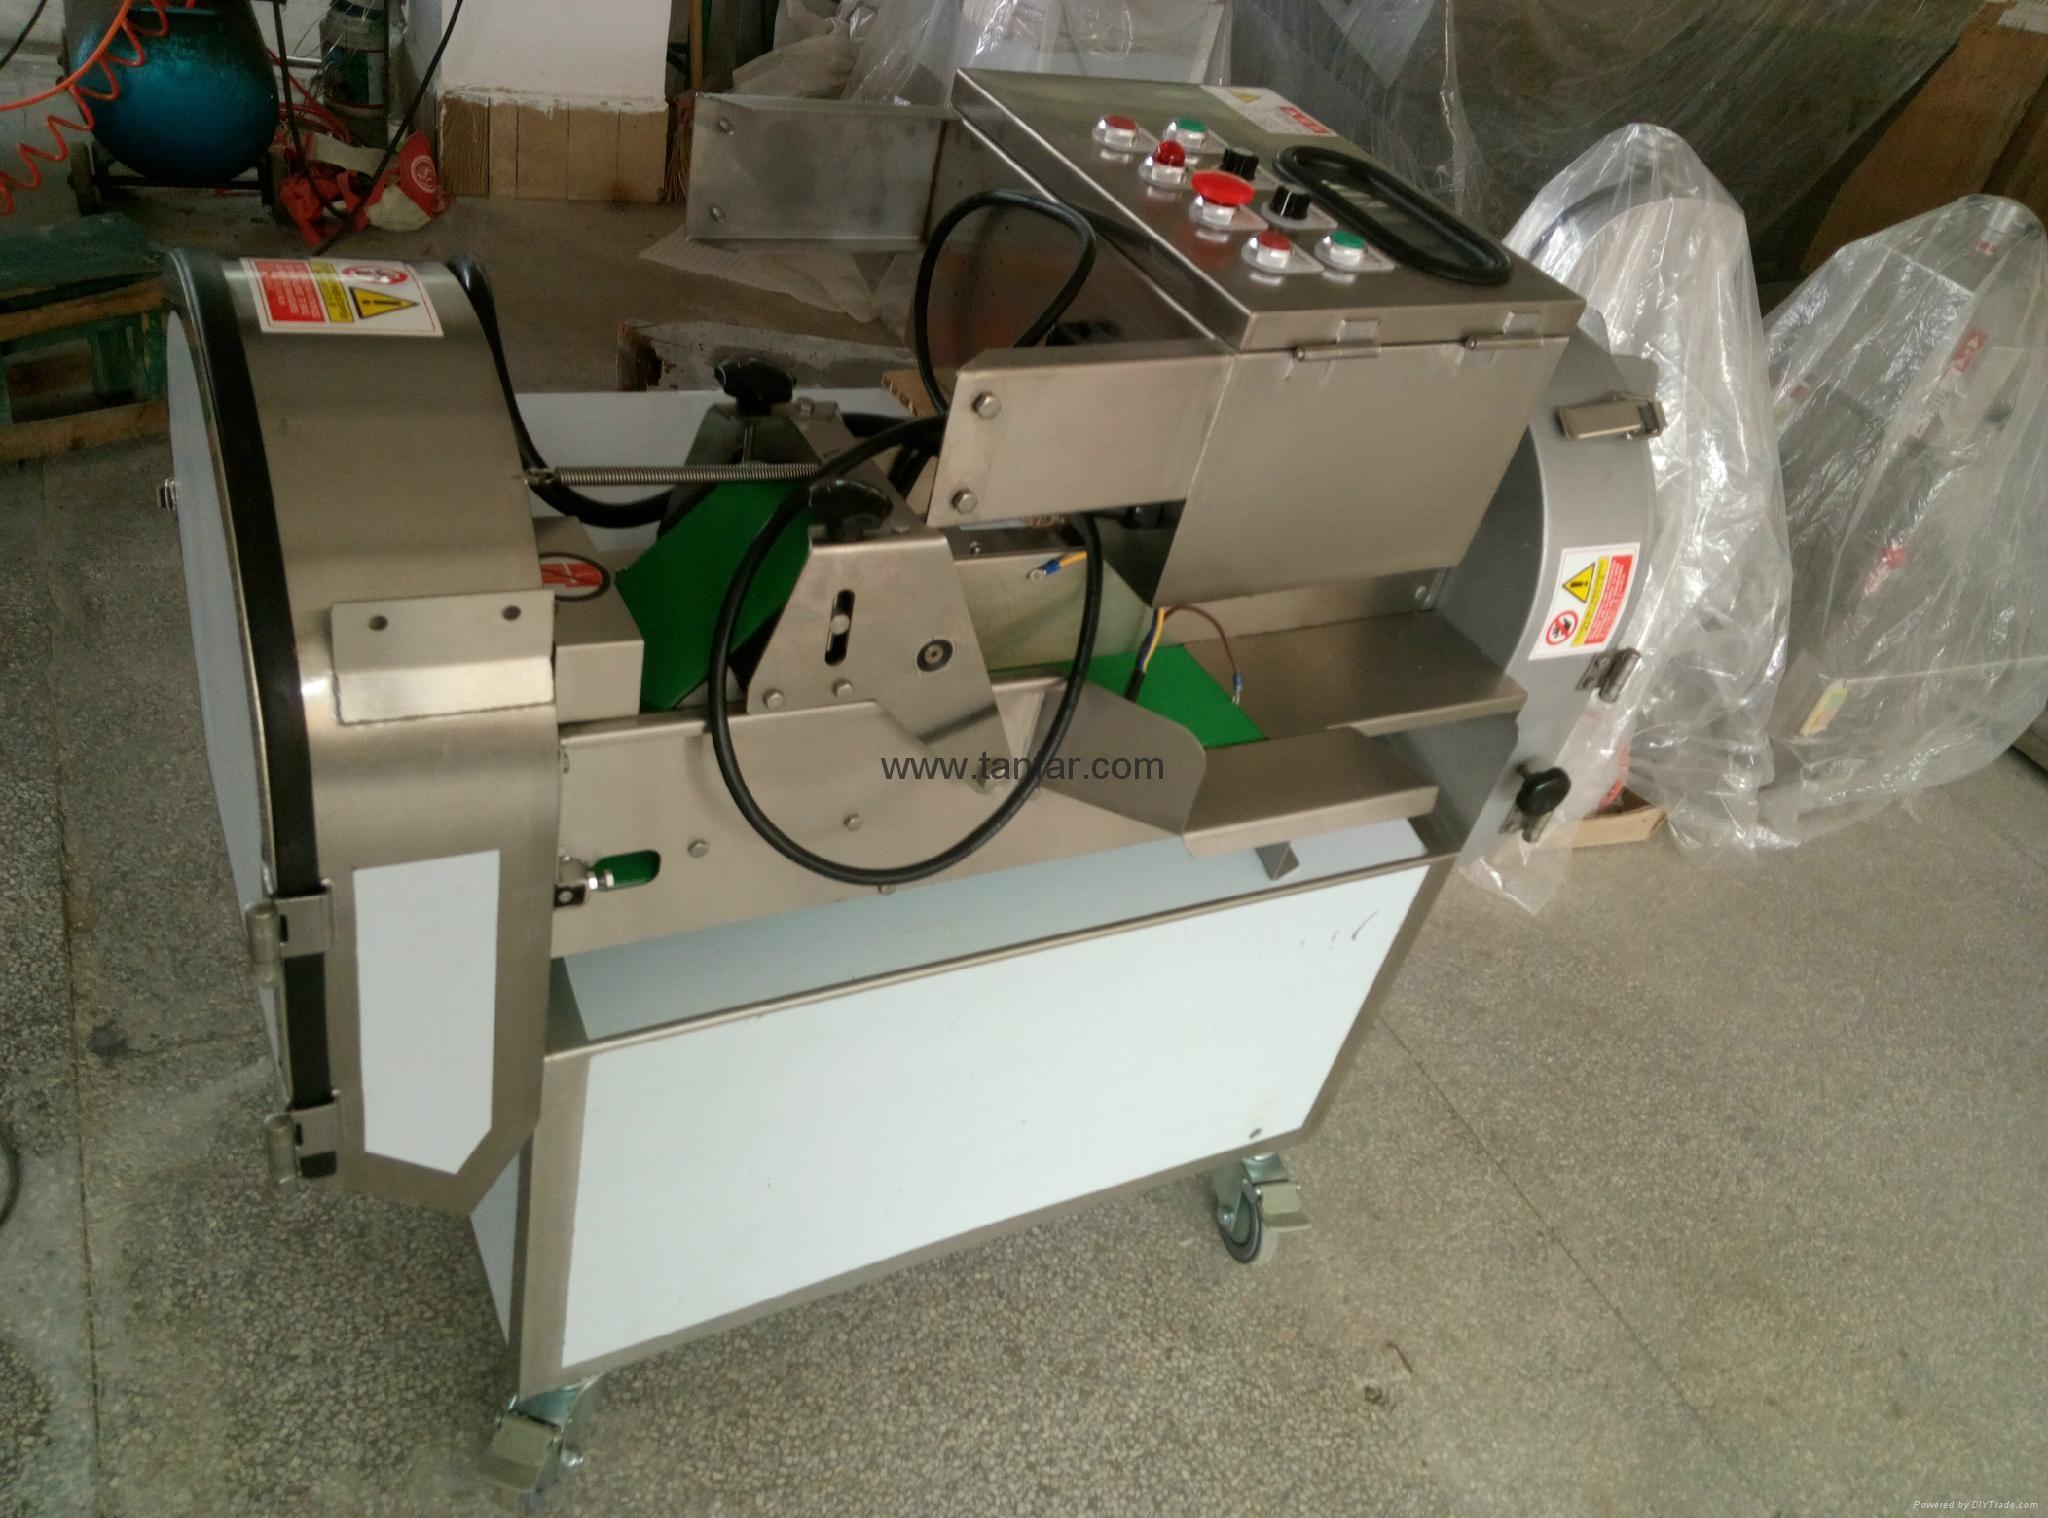 Suzumo SVC-ATC (Automatic Sushi Rolls Cutter) 19